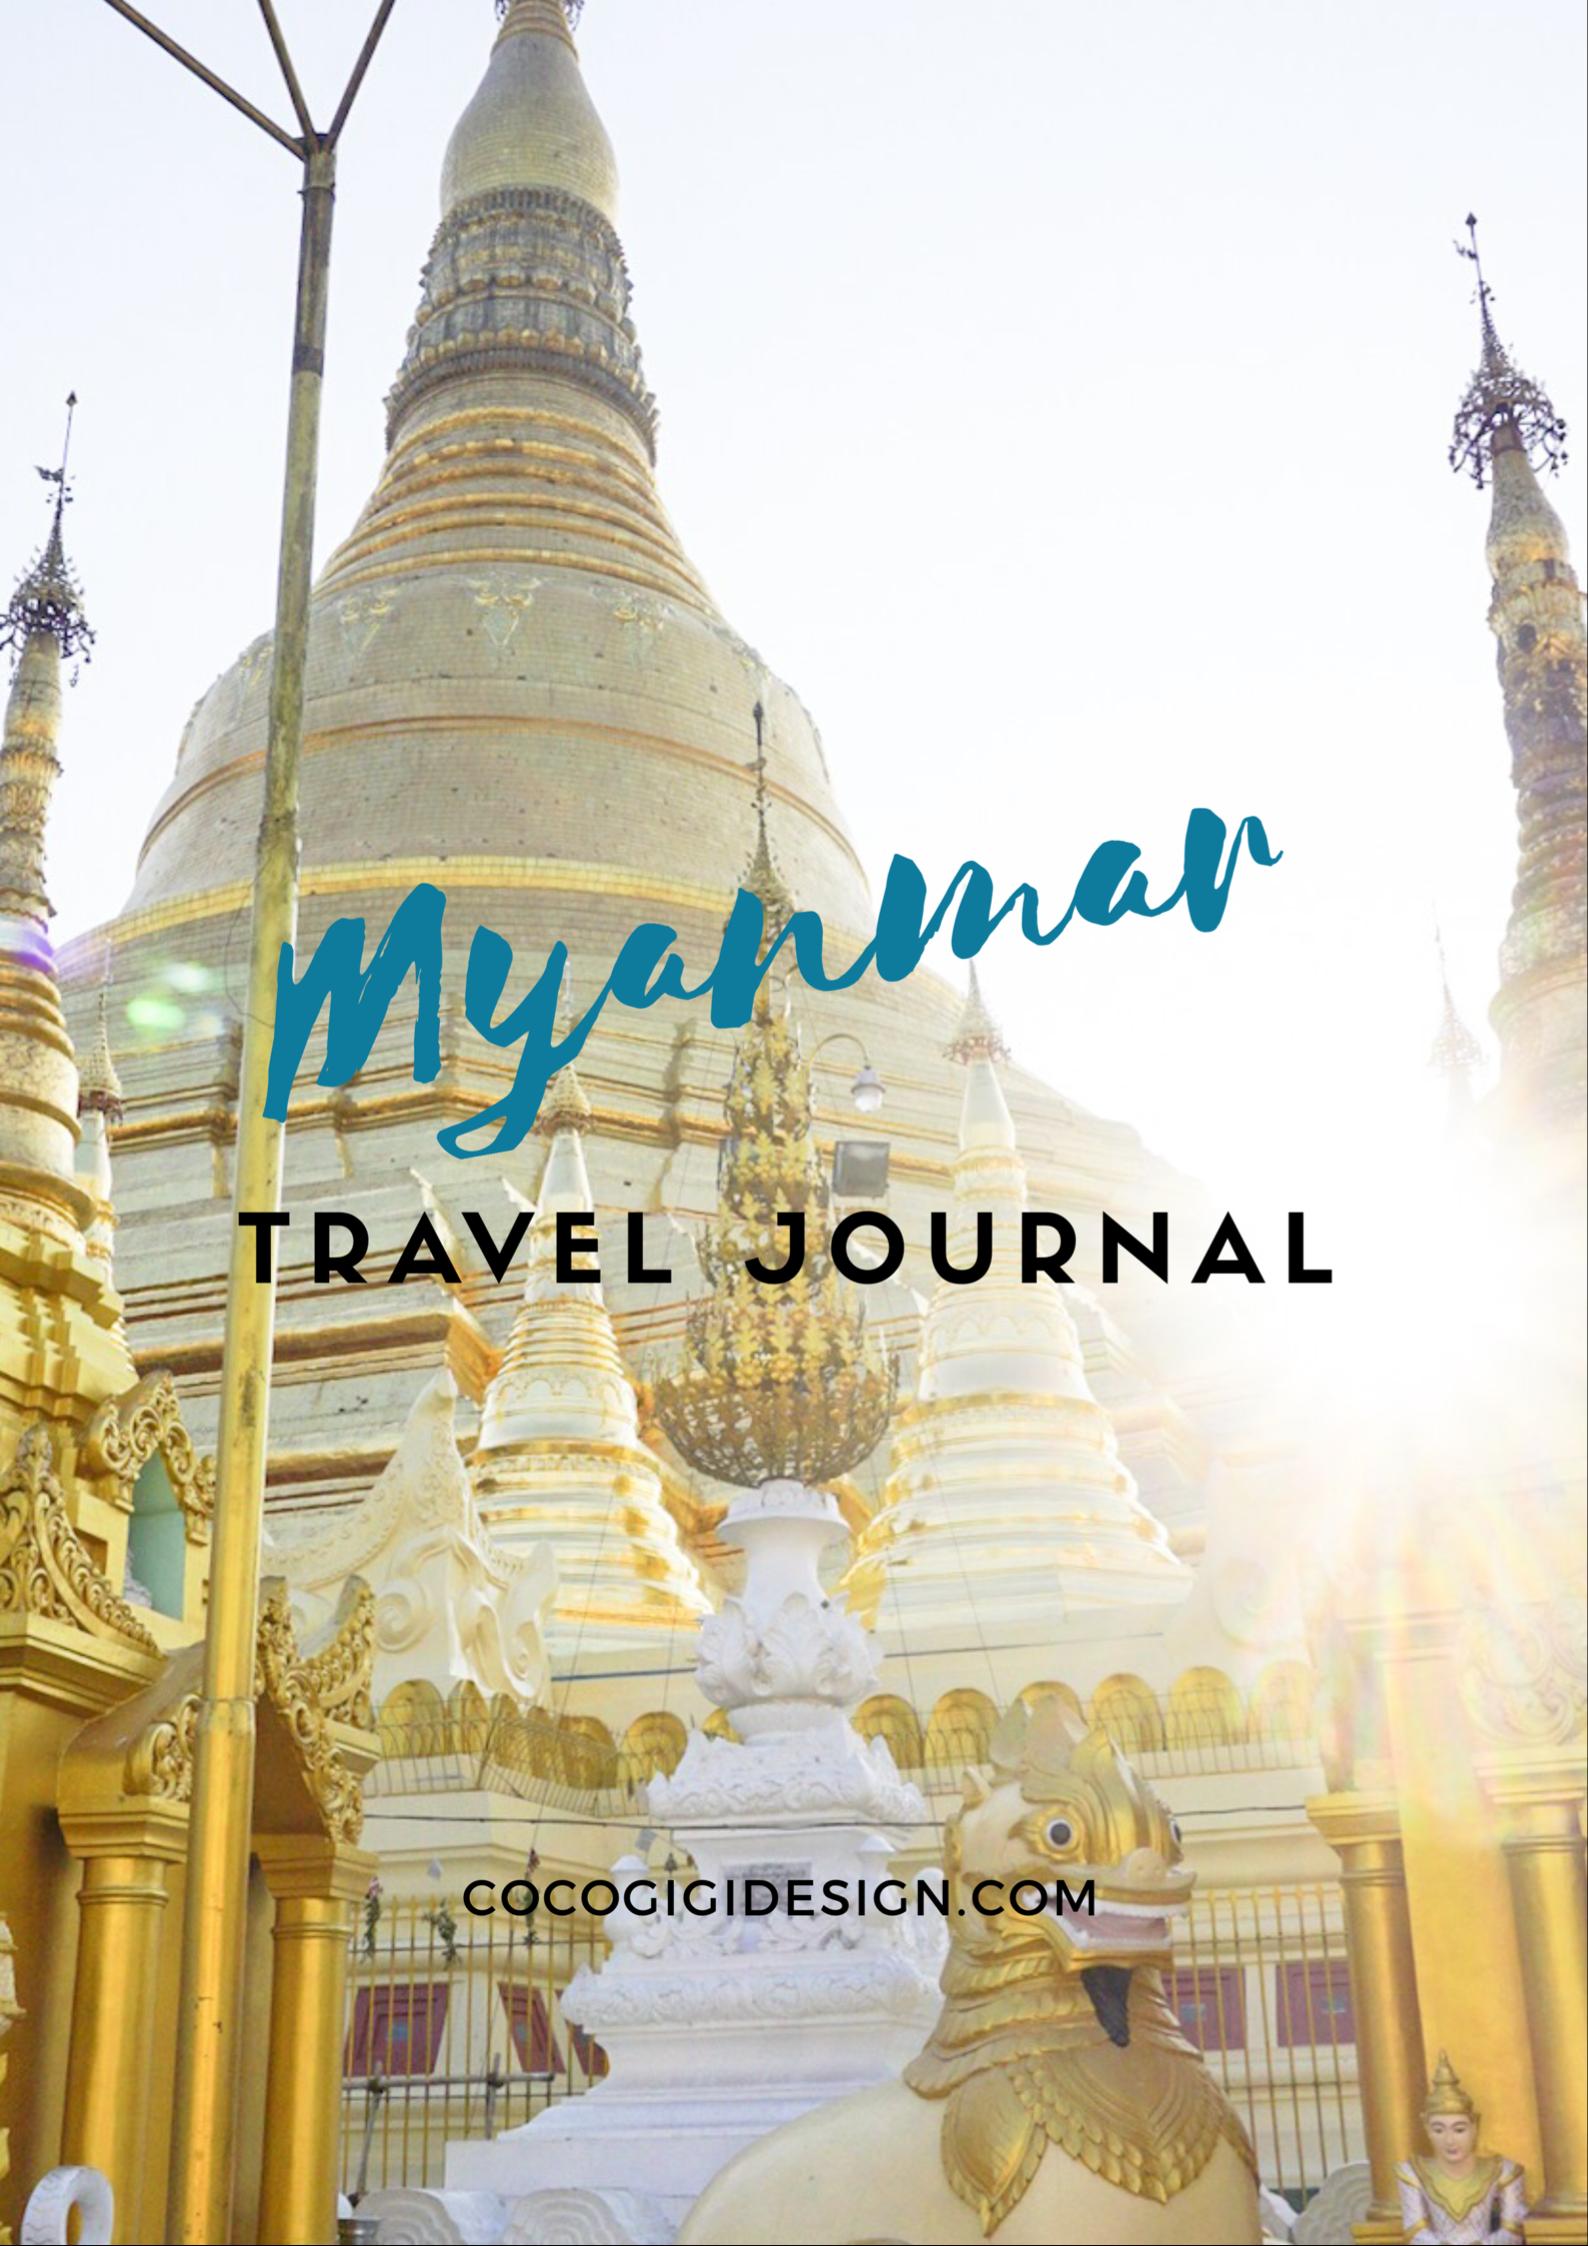 CocoGigiDesign - Myanmar travel journal 2018.png